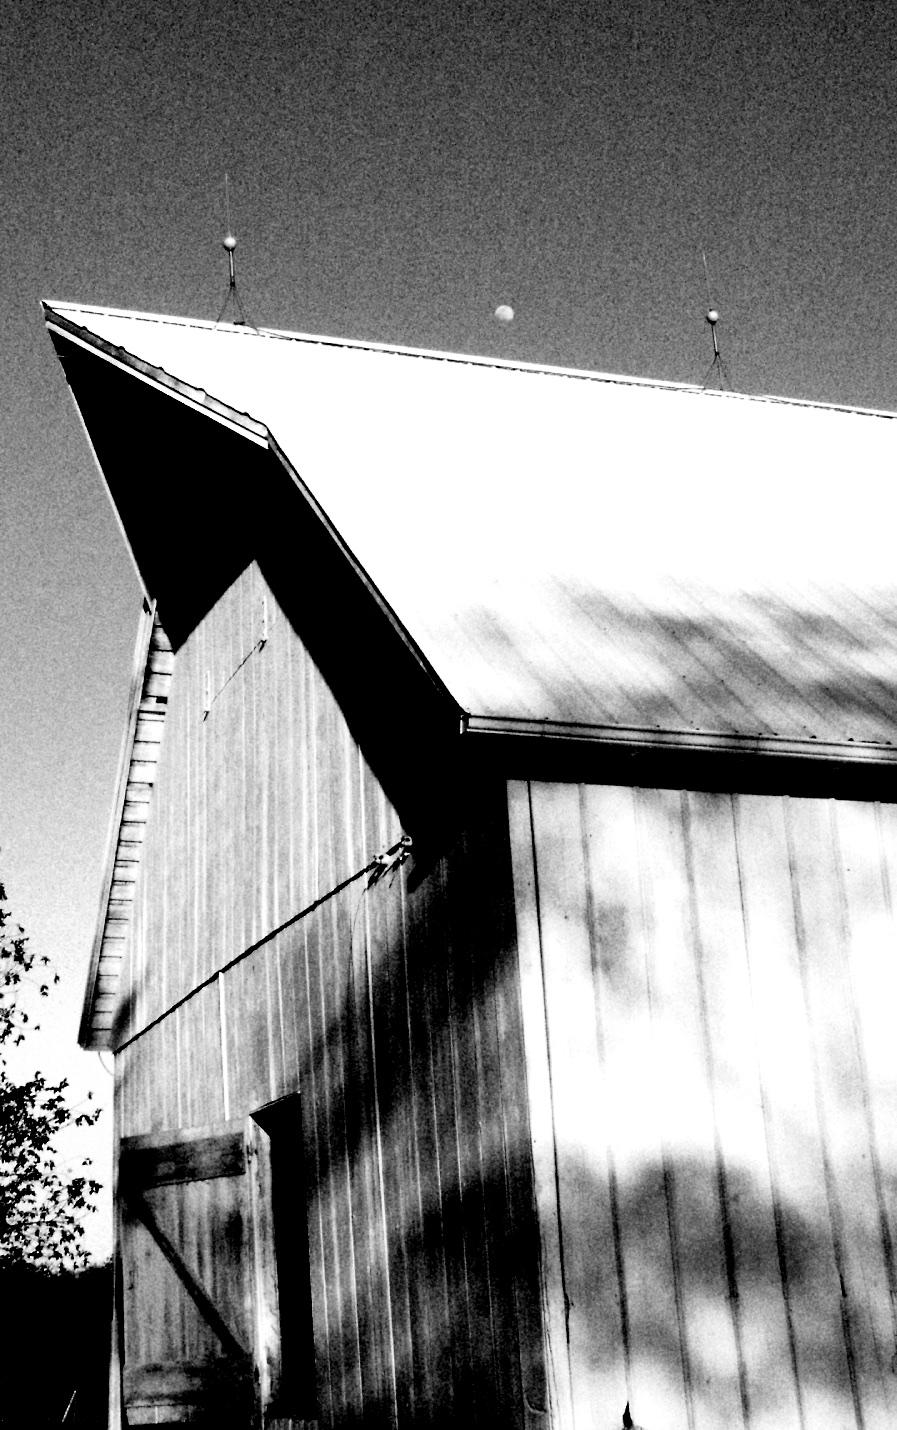 Cow Barn, May 2003